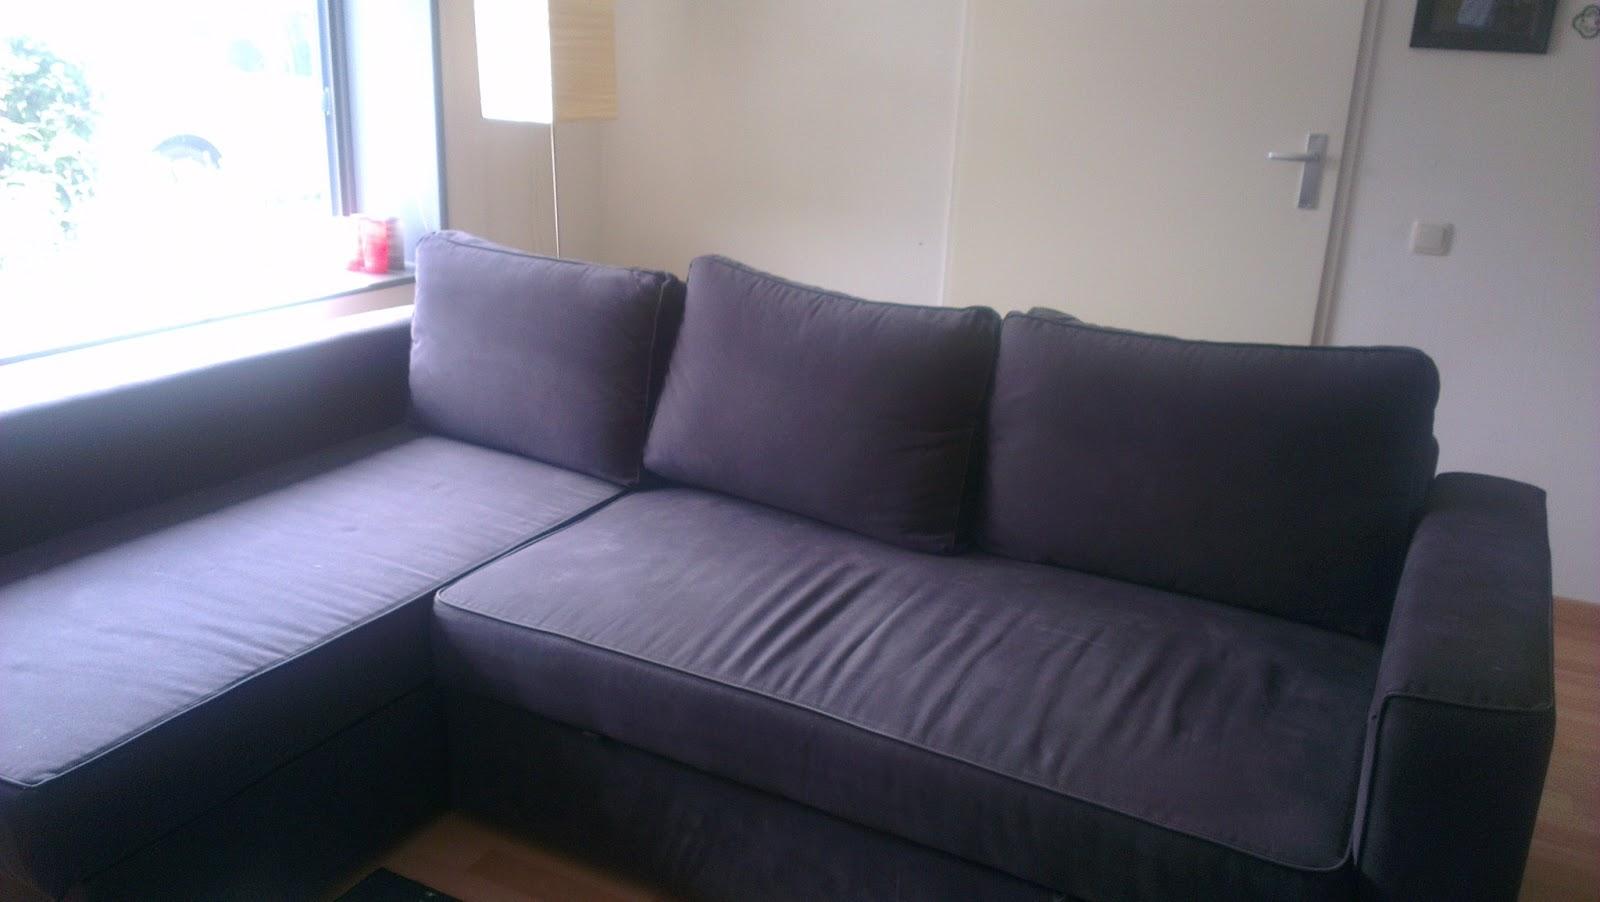 ikea couch sofa sectional manstad houzz sofas bed corner dark